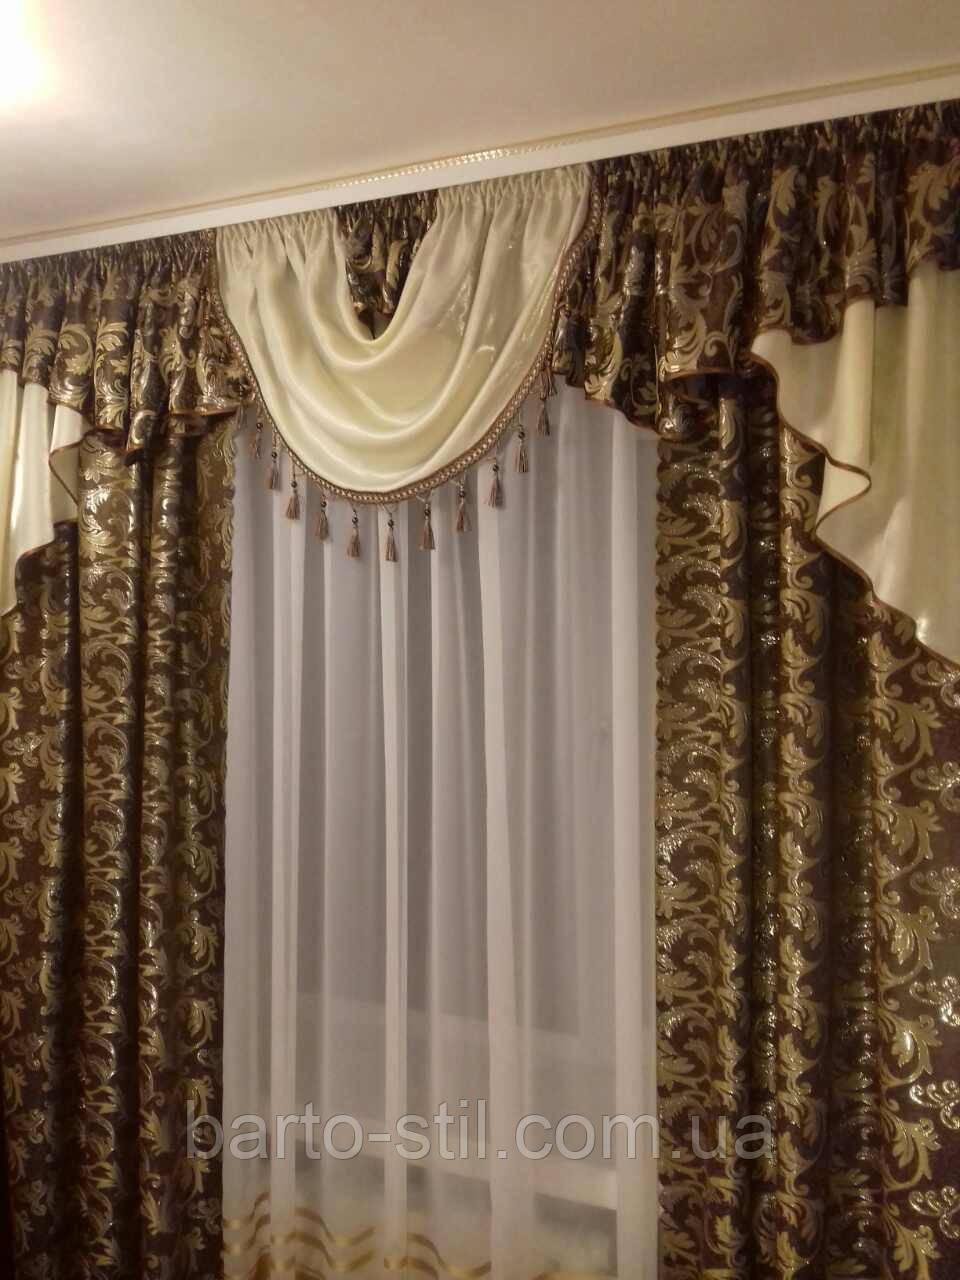 "Шторы с ламбрекеном ""Сандра нова"" на карниз 2.5 м - 3.5 м. Шоколадного цвета"